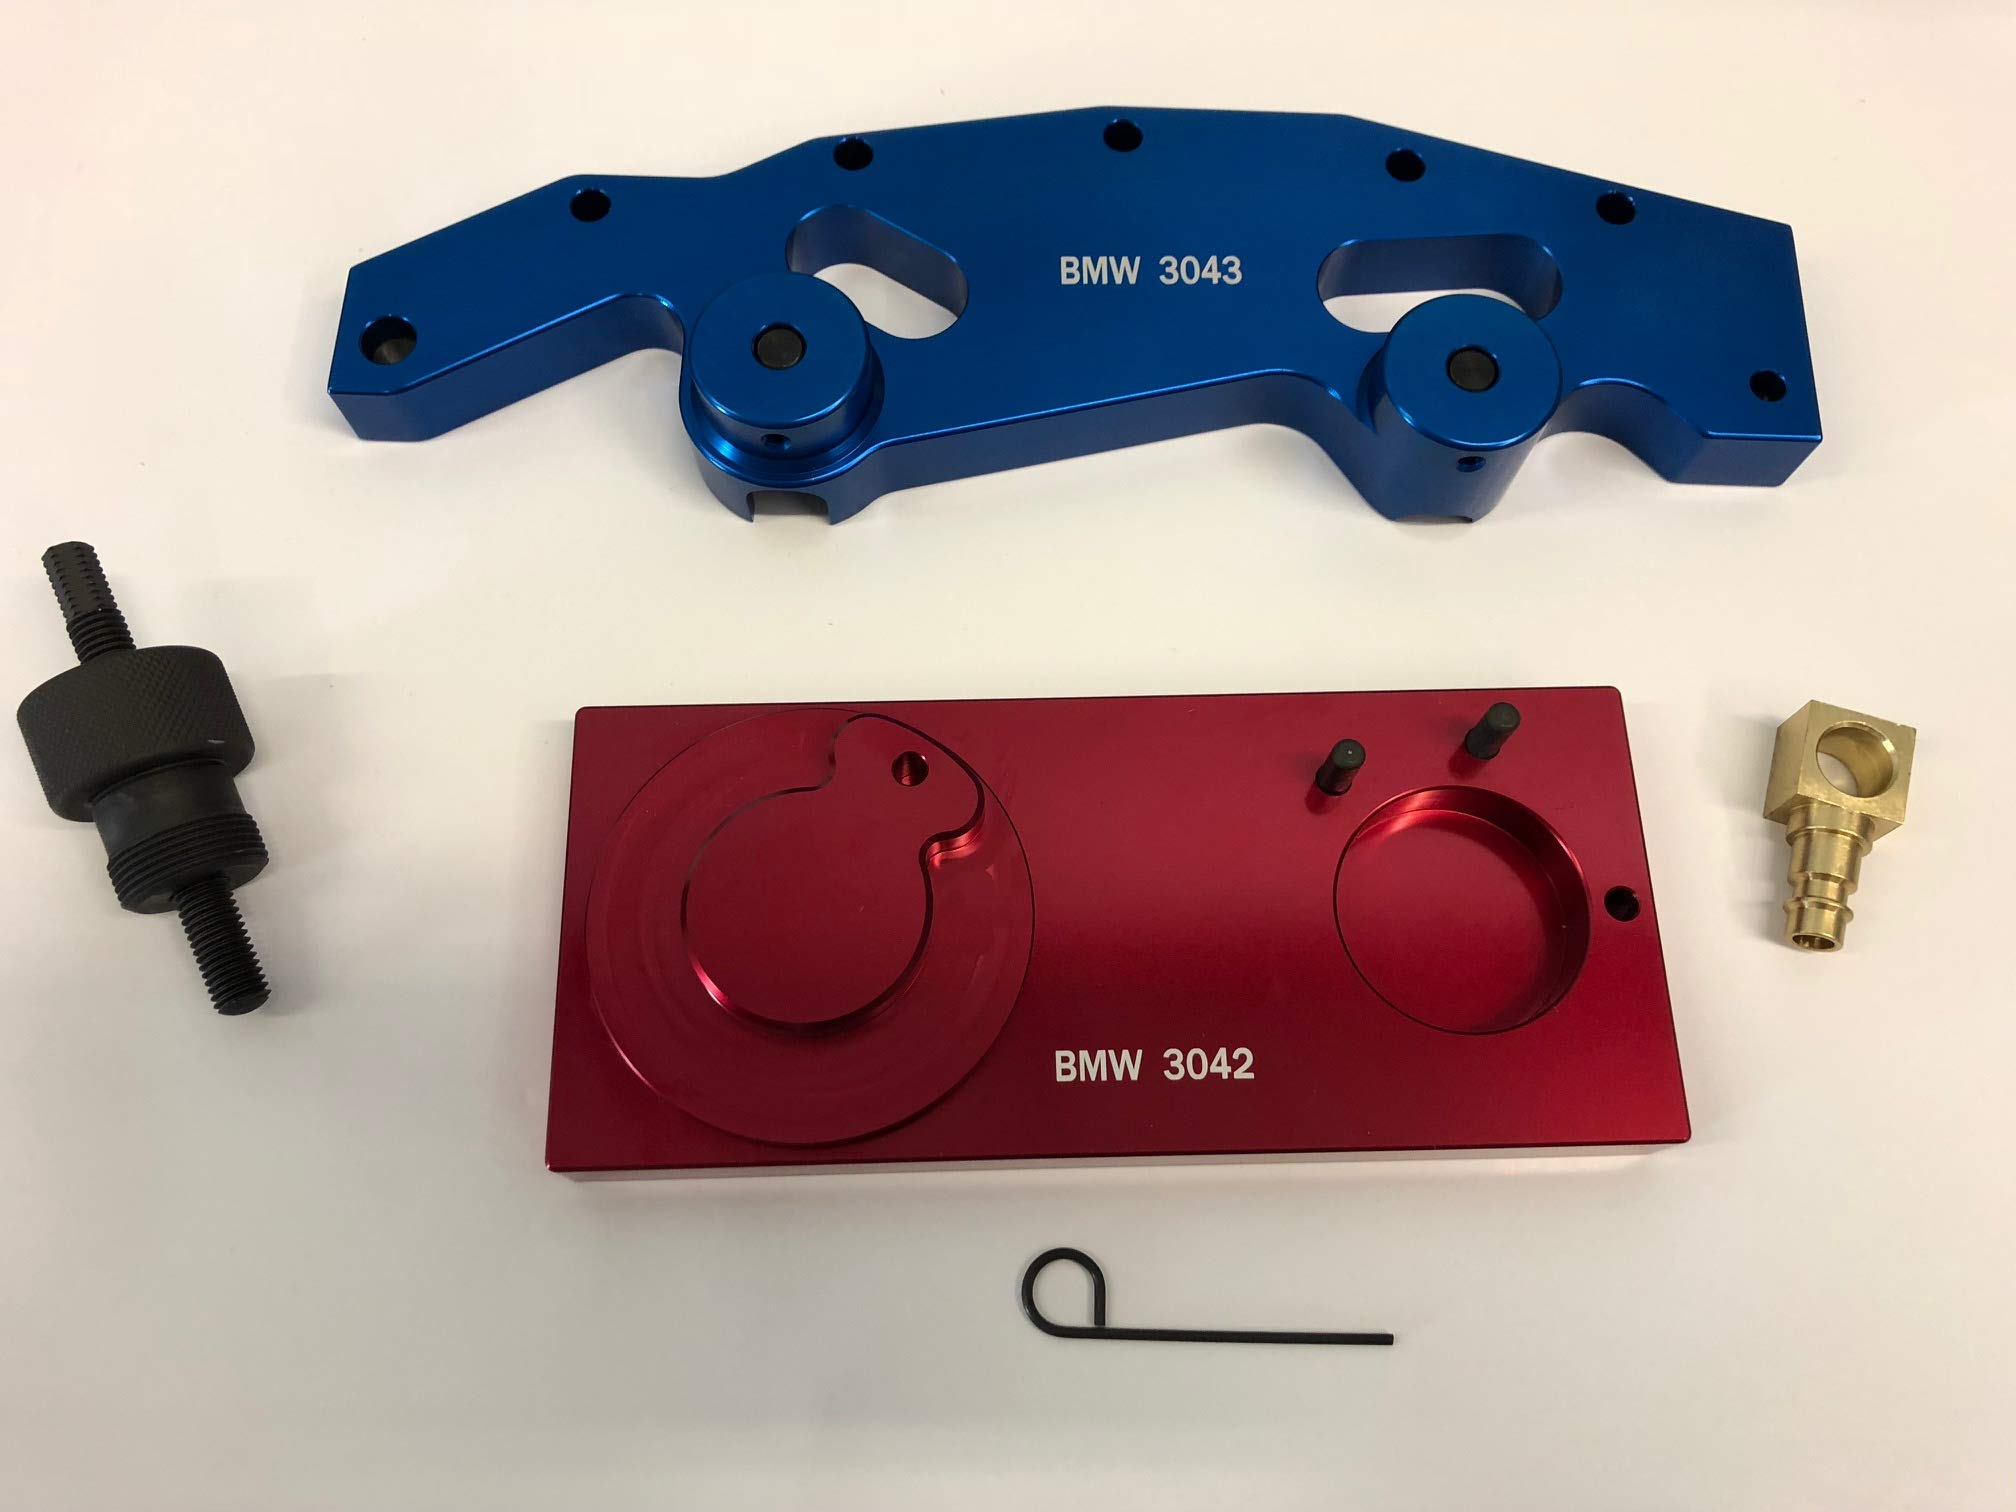 ZDMak Camshaft Alignment Tool Set for BMW Double VANOS M52TU M54 M56 by ZDMak (Image #1)